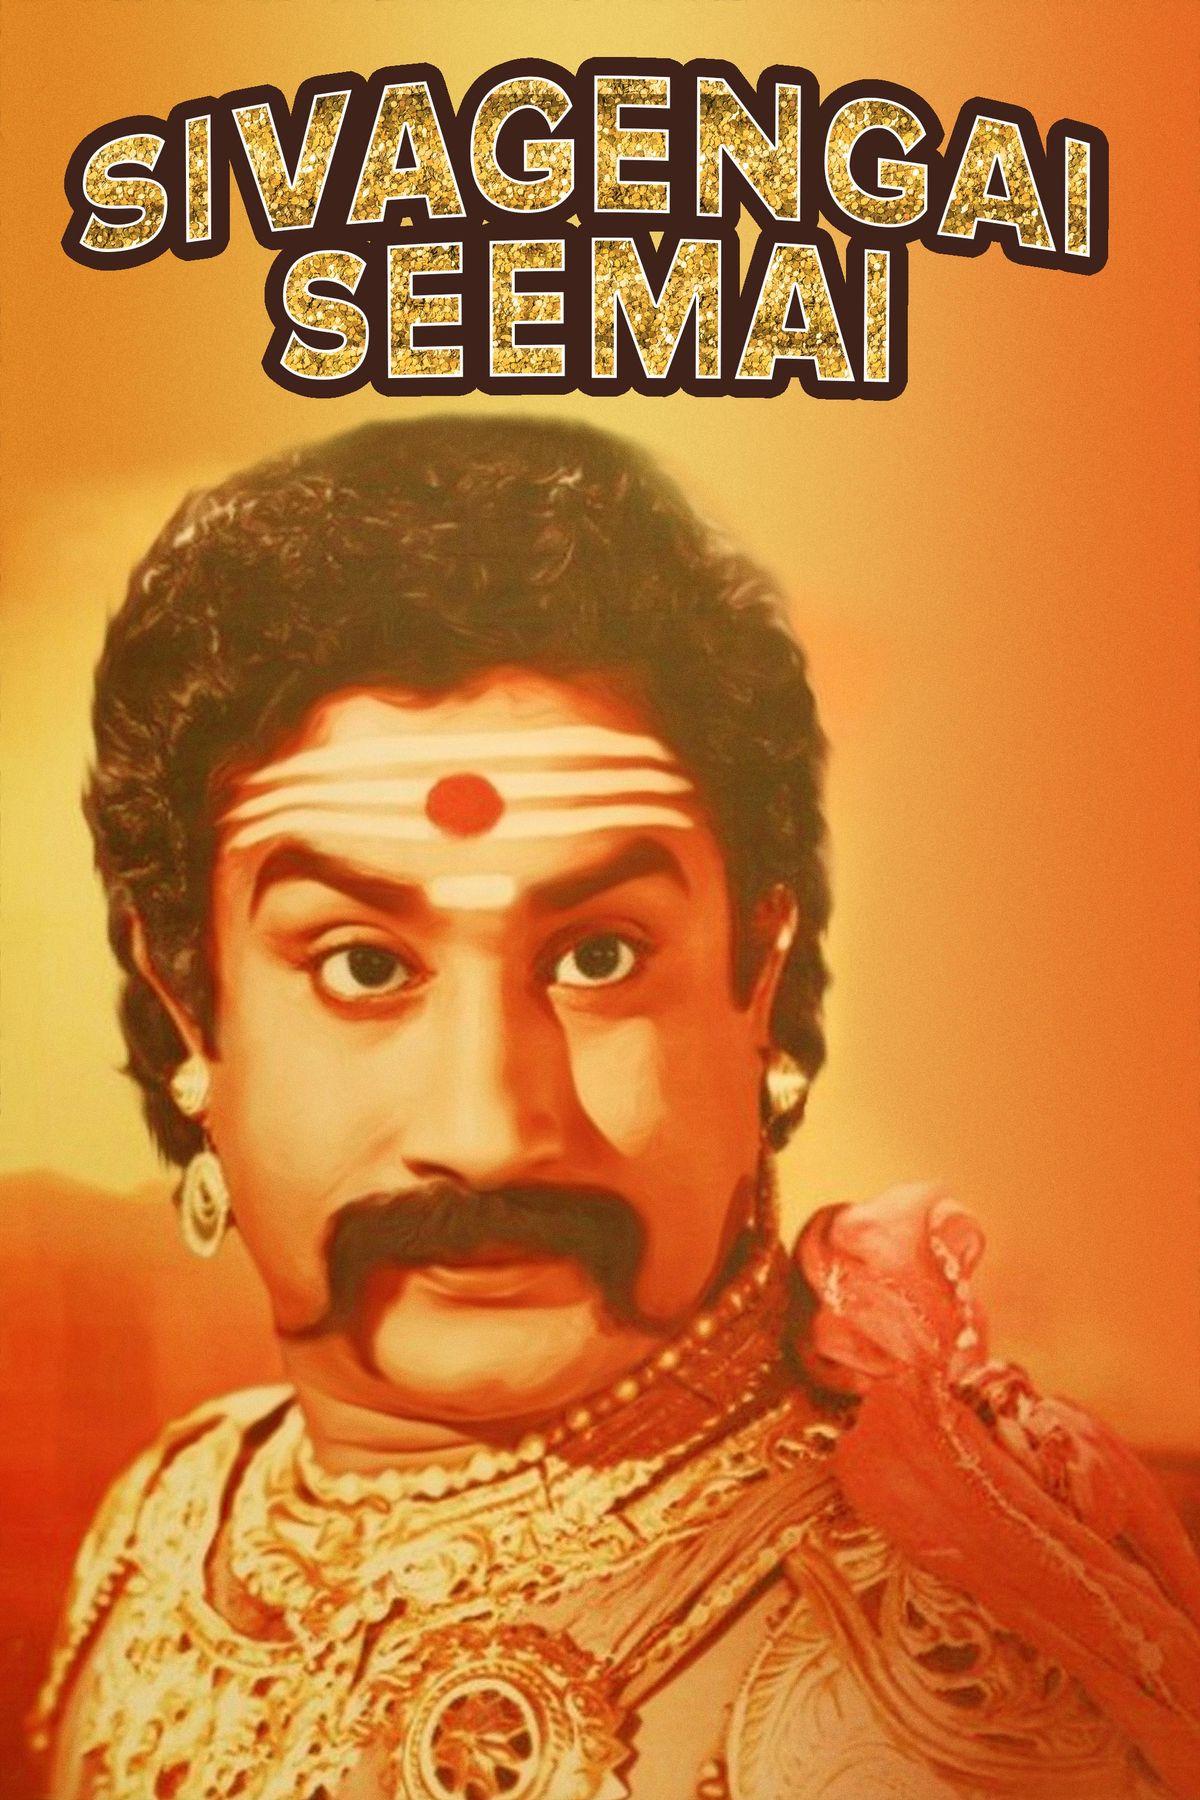 Prabhu Best Movies, TV Shows and Web Series List